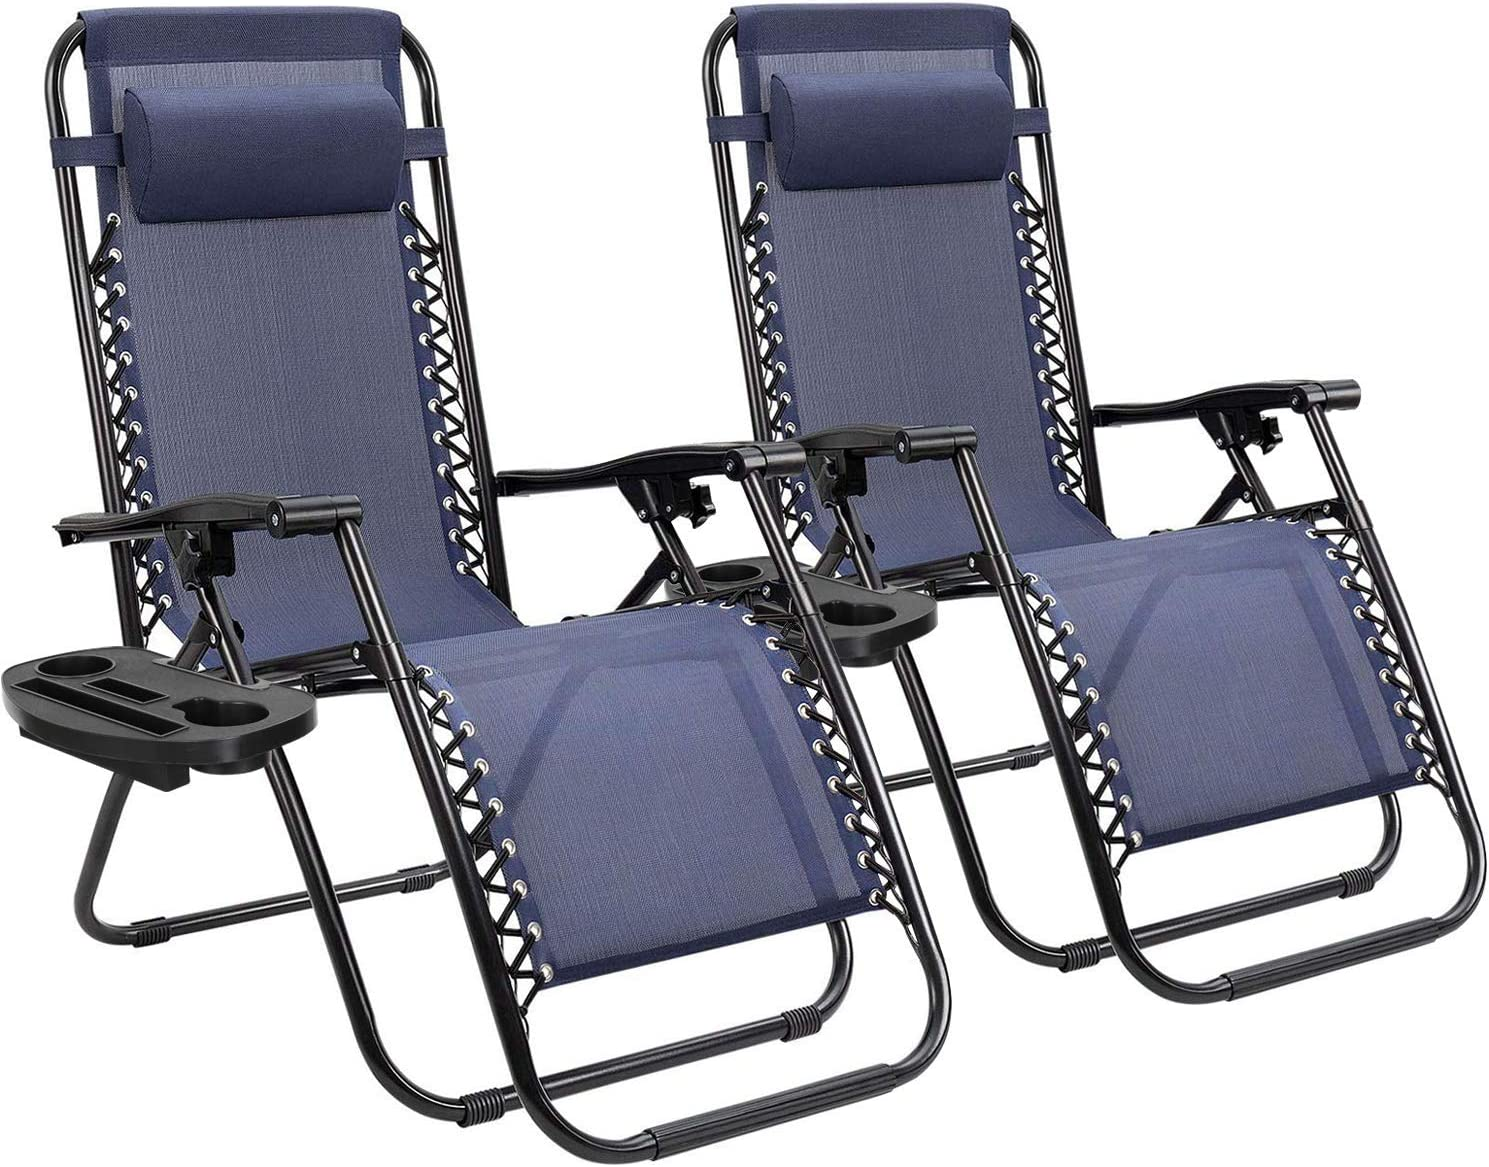 Homall 300 Pounds Regular Sized Zero Gravity Chair